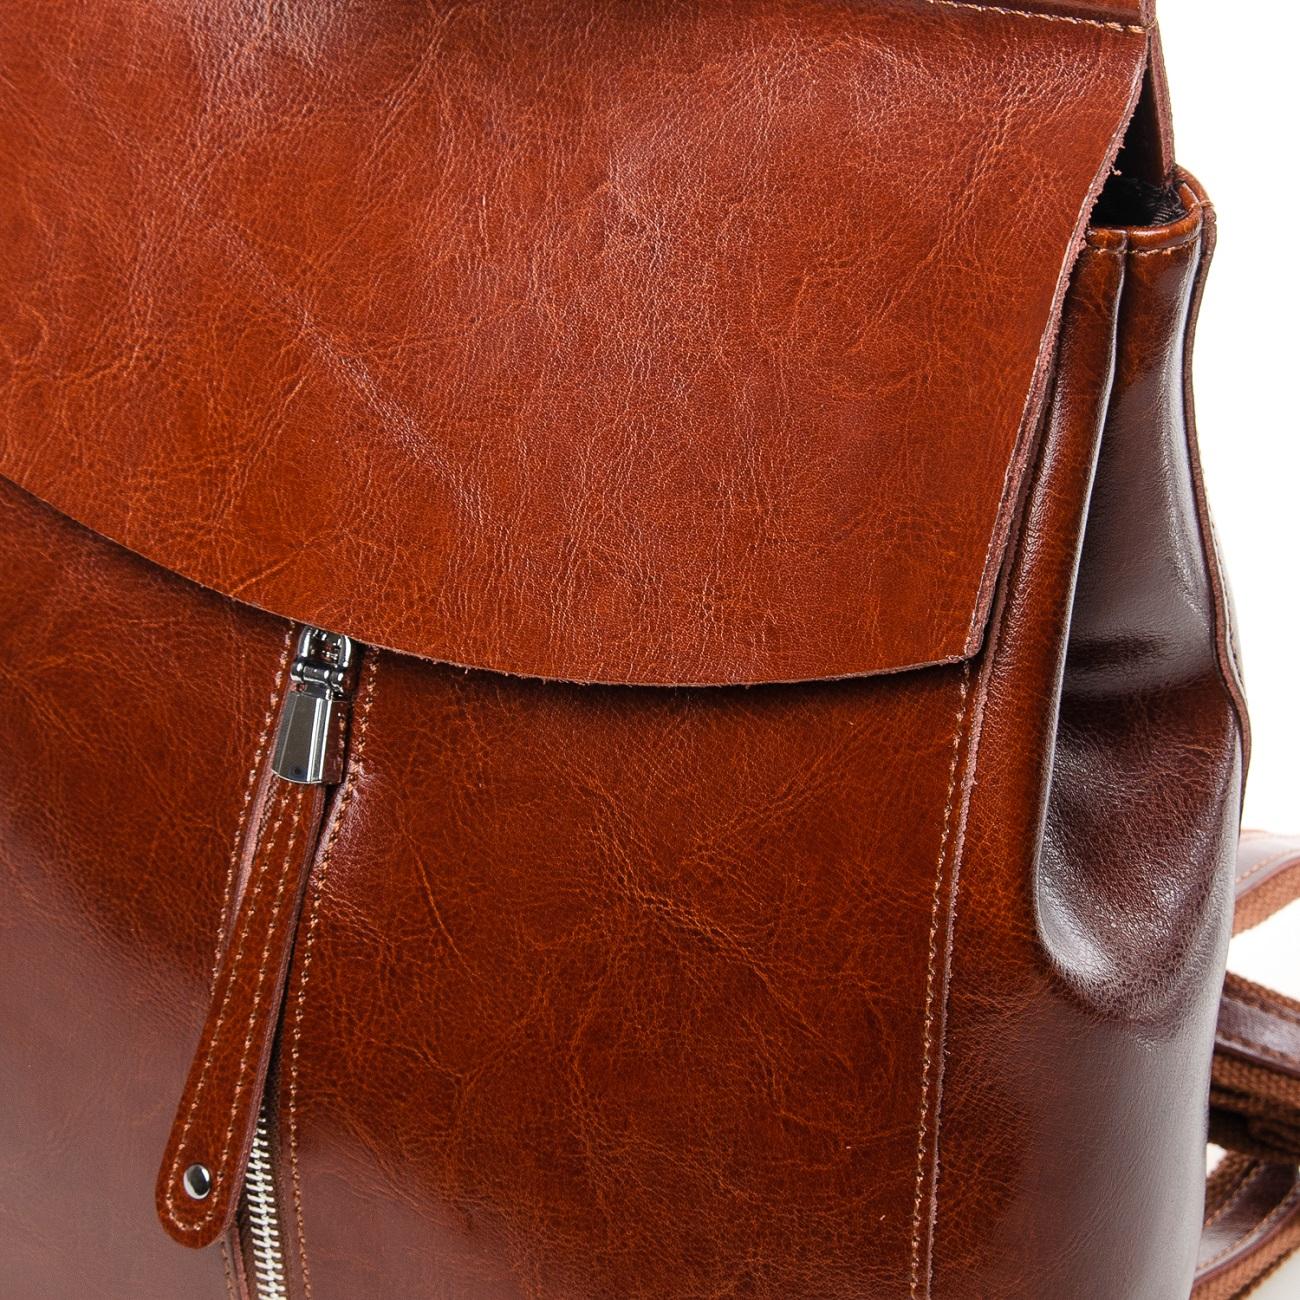 Сумка Женская Рюкзак кожа ALEX RAI 7-02 3206 khaki - фото 5